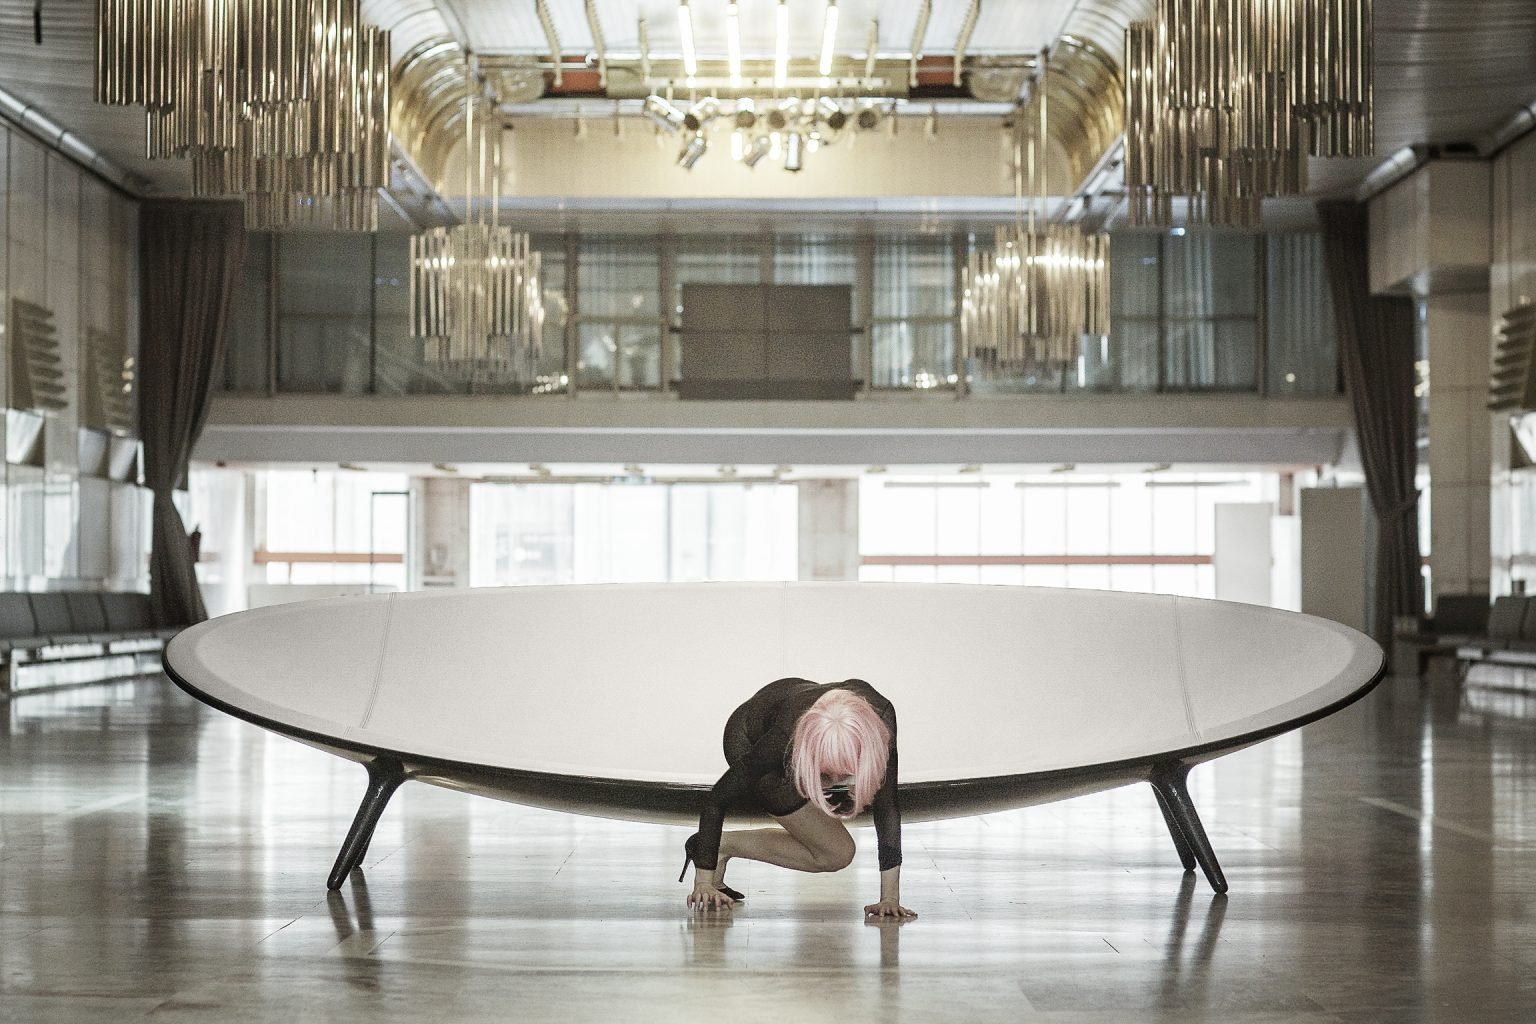 Biennale Interieur - Belgium's leading design and interior event - Islelounge_xs_1.jpg